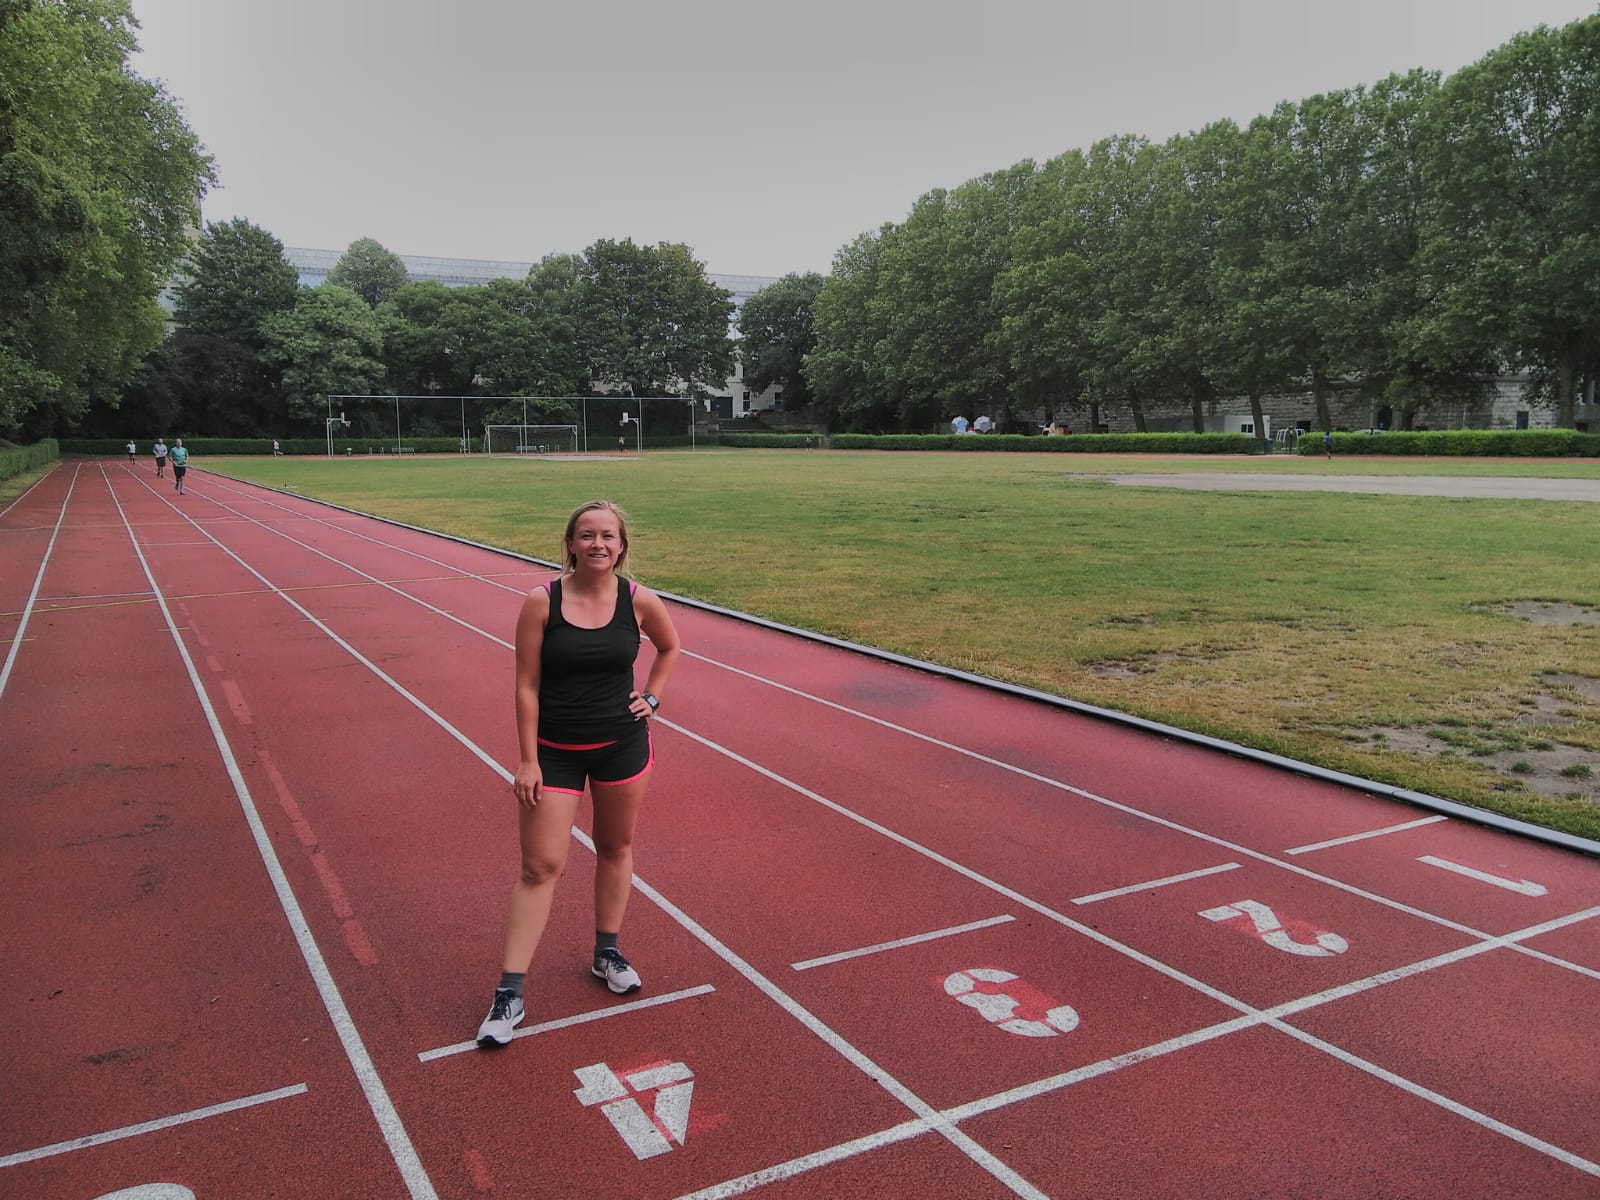 Hardlopen in Brussel jubelpark atletiekbaan